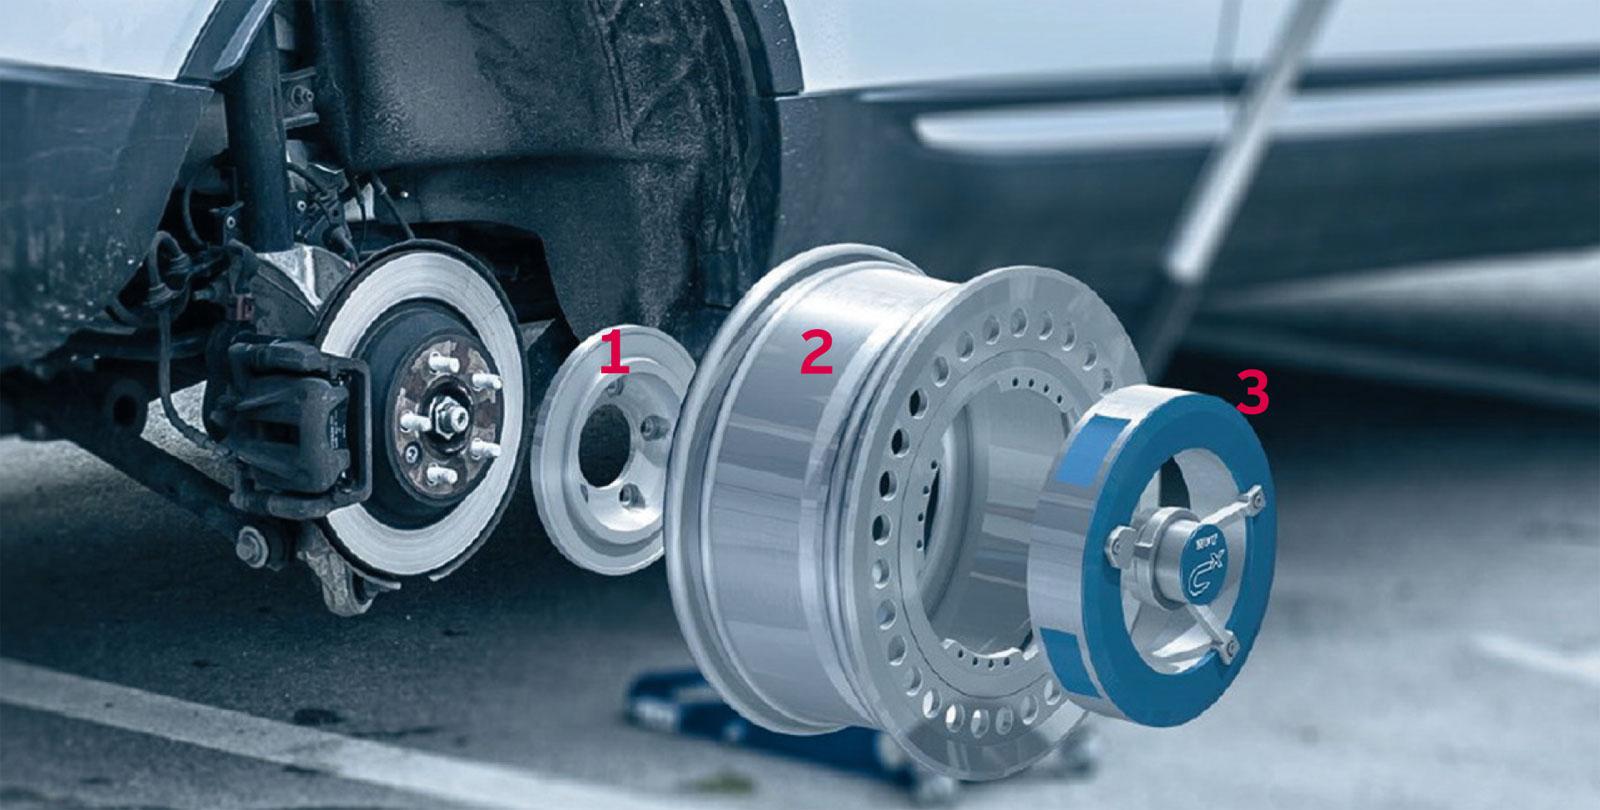 6-component Wheel Force Transducer - imc Test & Measurement GmbH